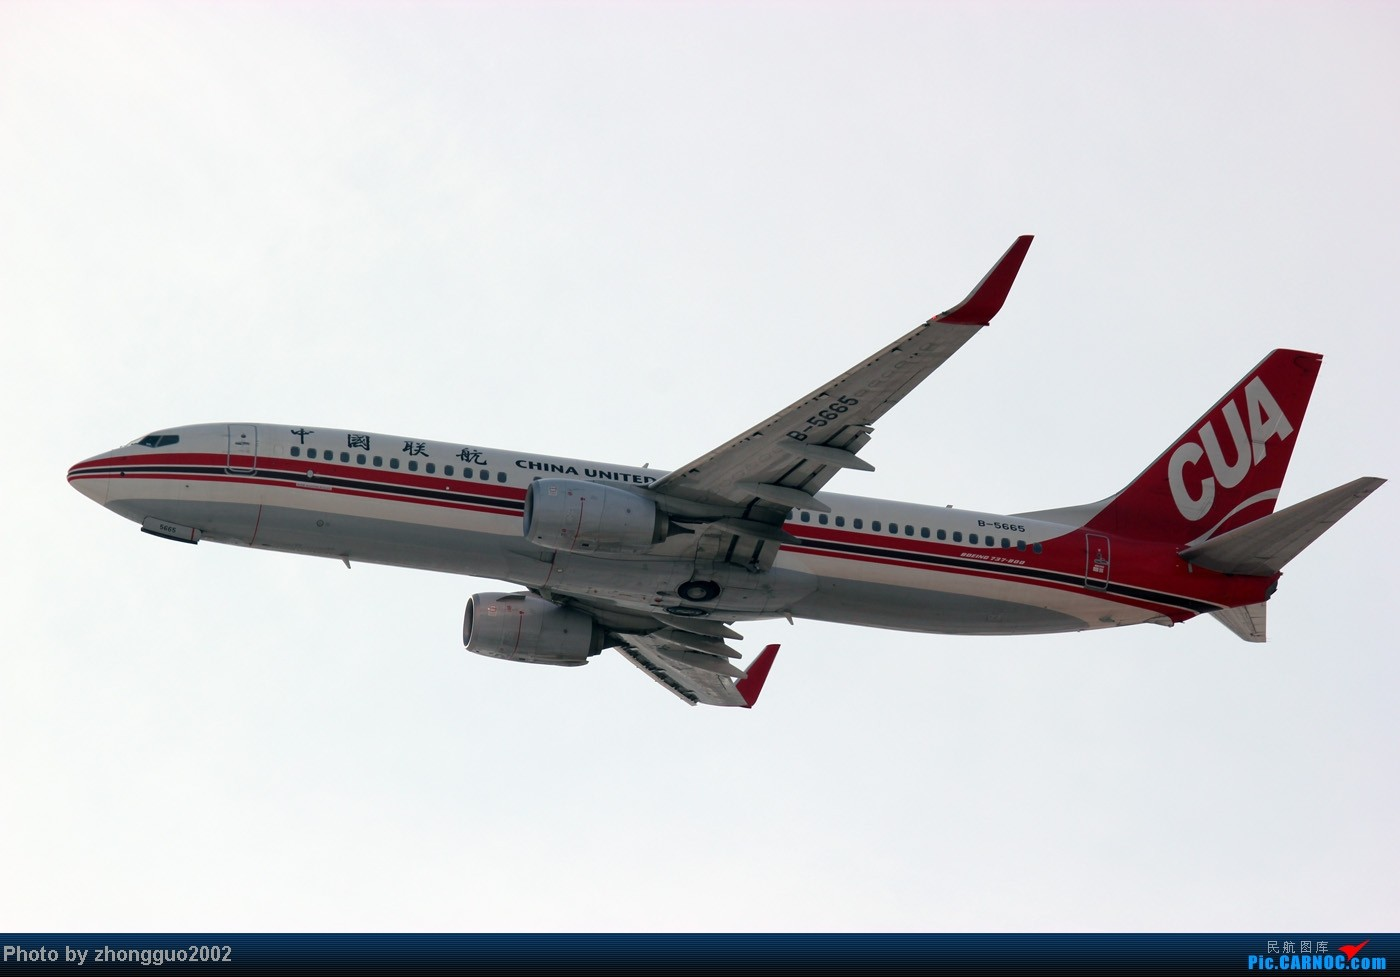 Re:[原创]随着2012年的最后一场雪的到了,我的2012年拍机工作也圆满的结束了,把这段时间里灰机整理一下,把没发的,我个人认为好的发上来! BOEING 737-800 B-5665 中国呼和浩特白塔国际机场